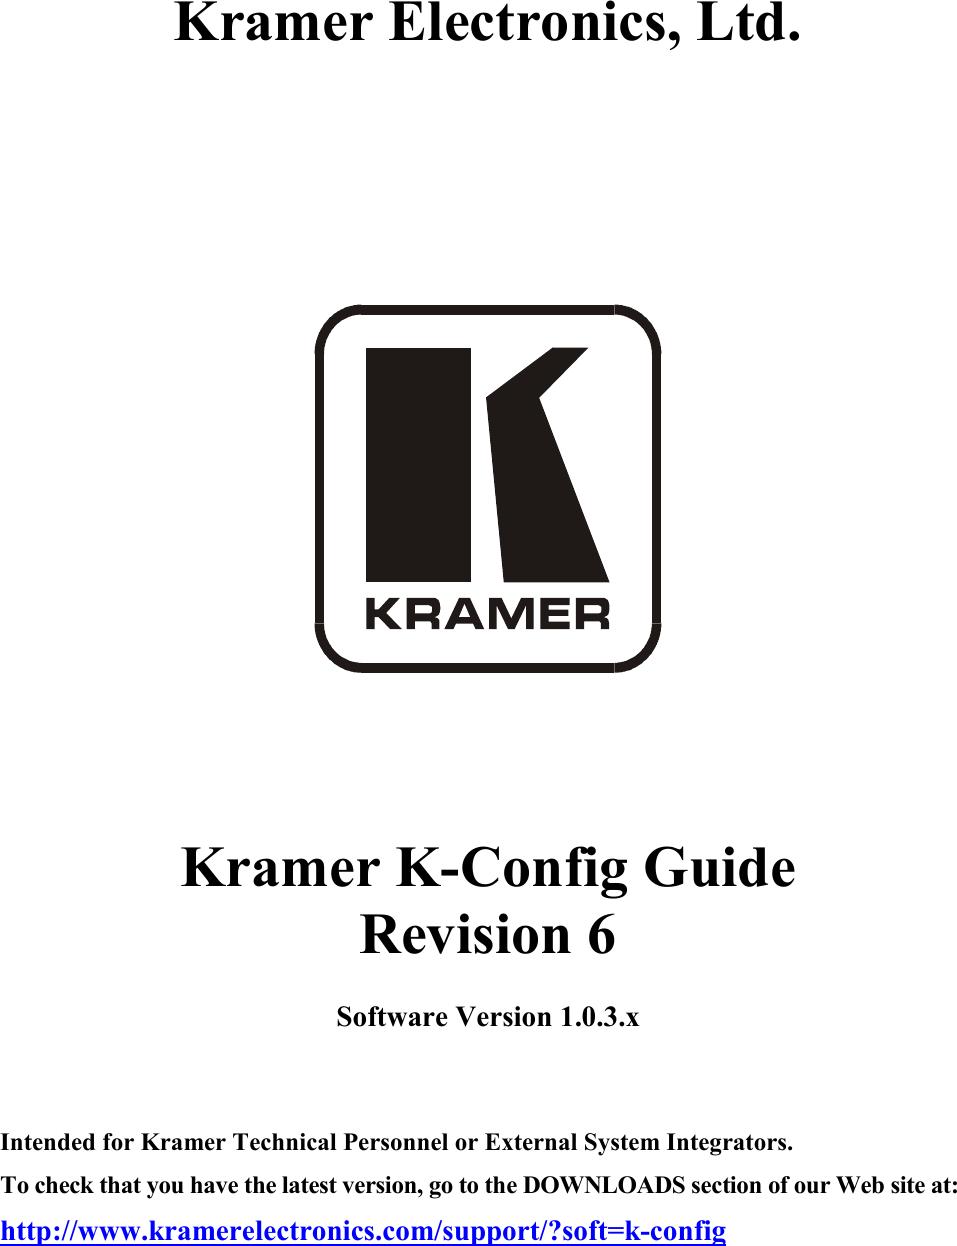 SL-1N Kramer Electronics Controllers; Master Rom